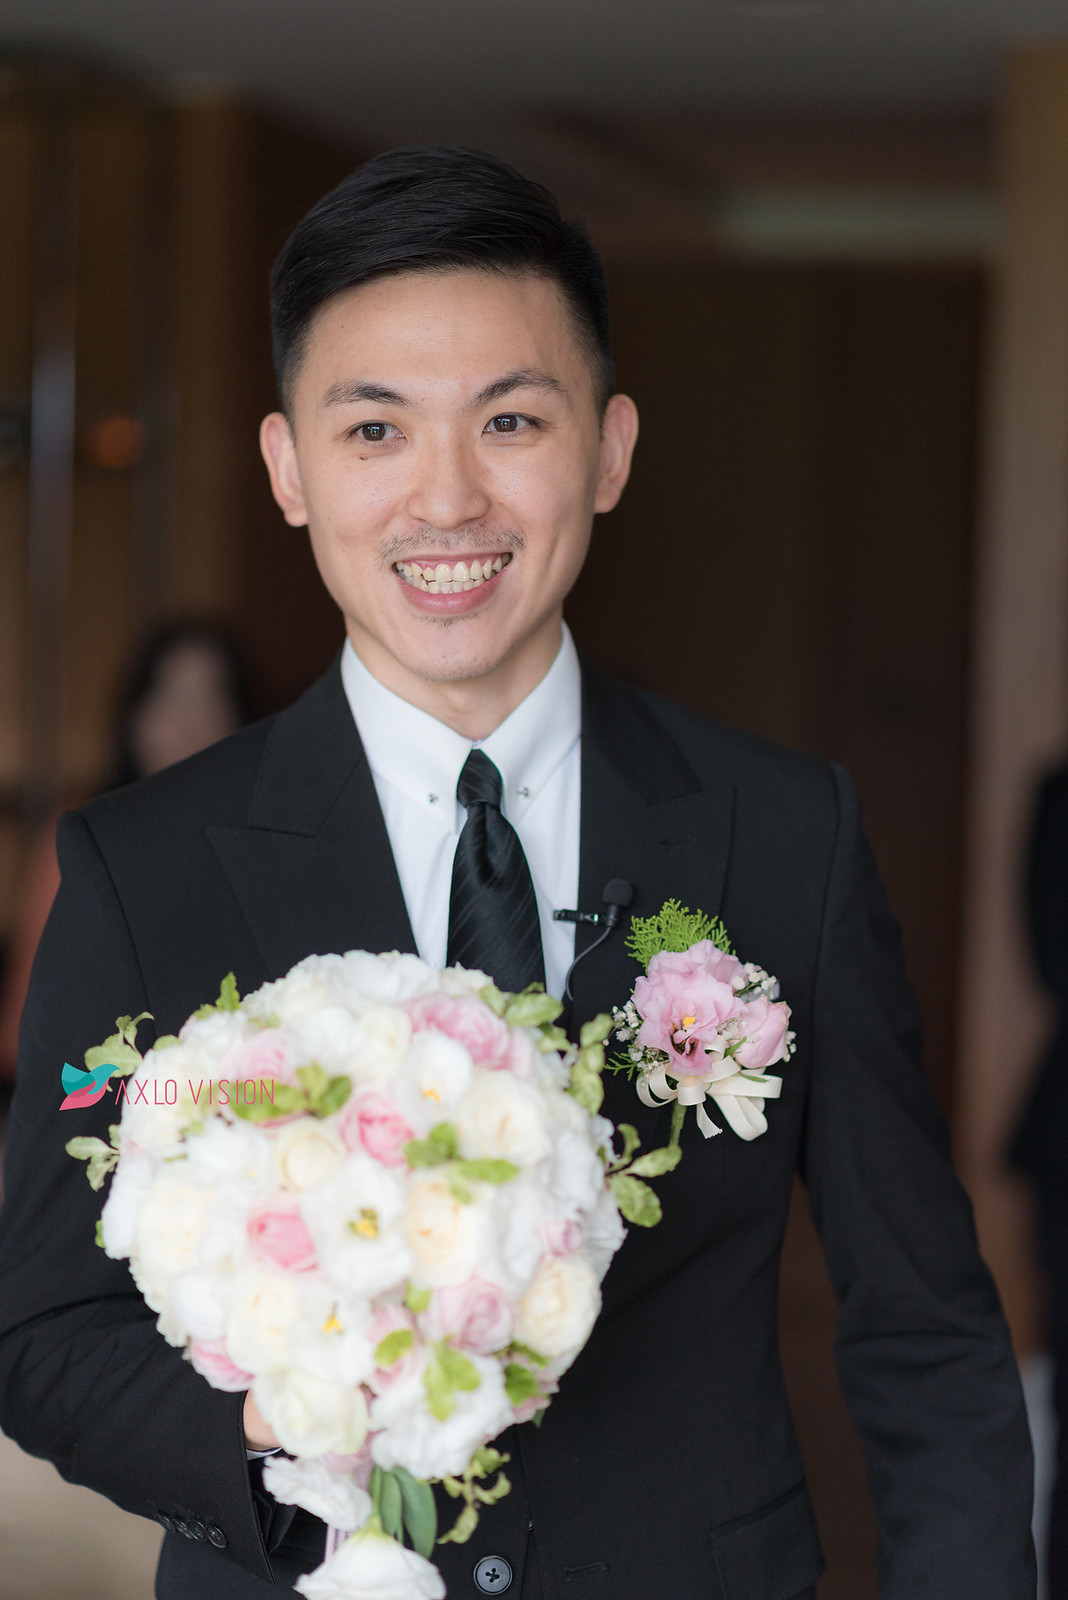 20170916 WeddingDay_075